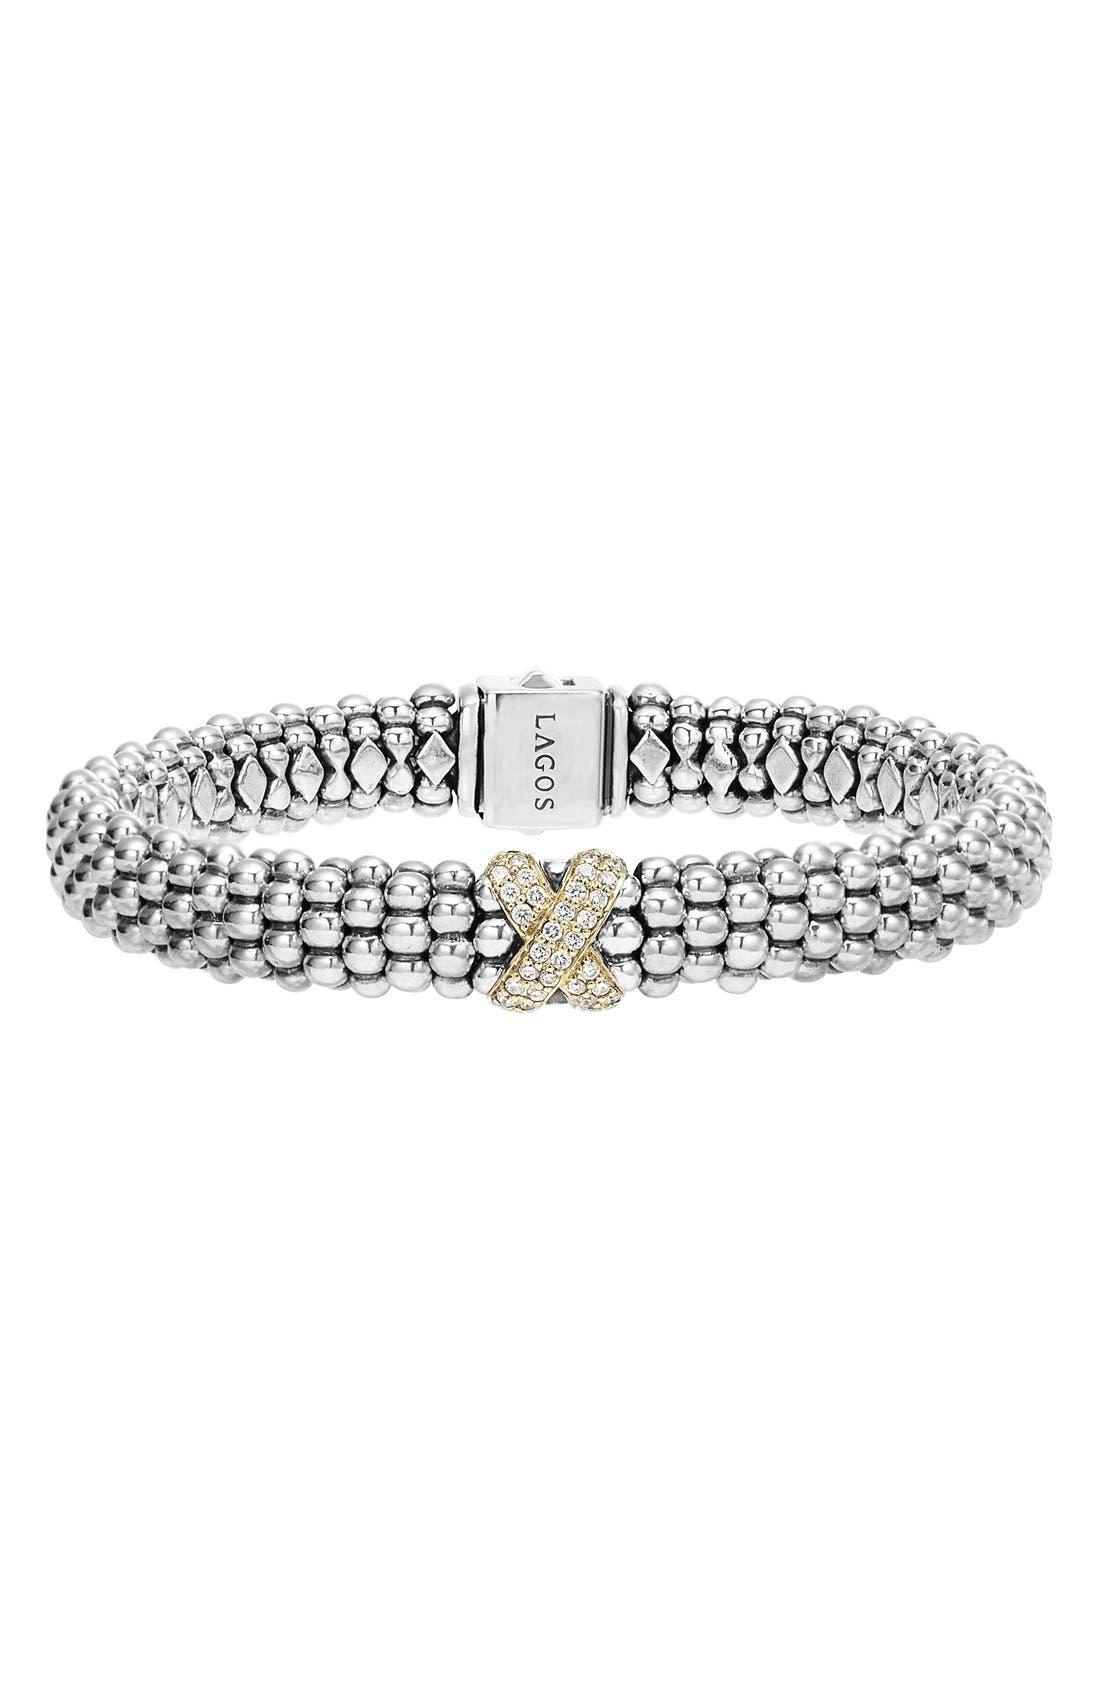 'Caviar' Gold Diamond Rope Bracelet,                         Main,                         color, Silver/ Gold